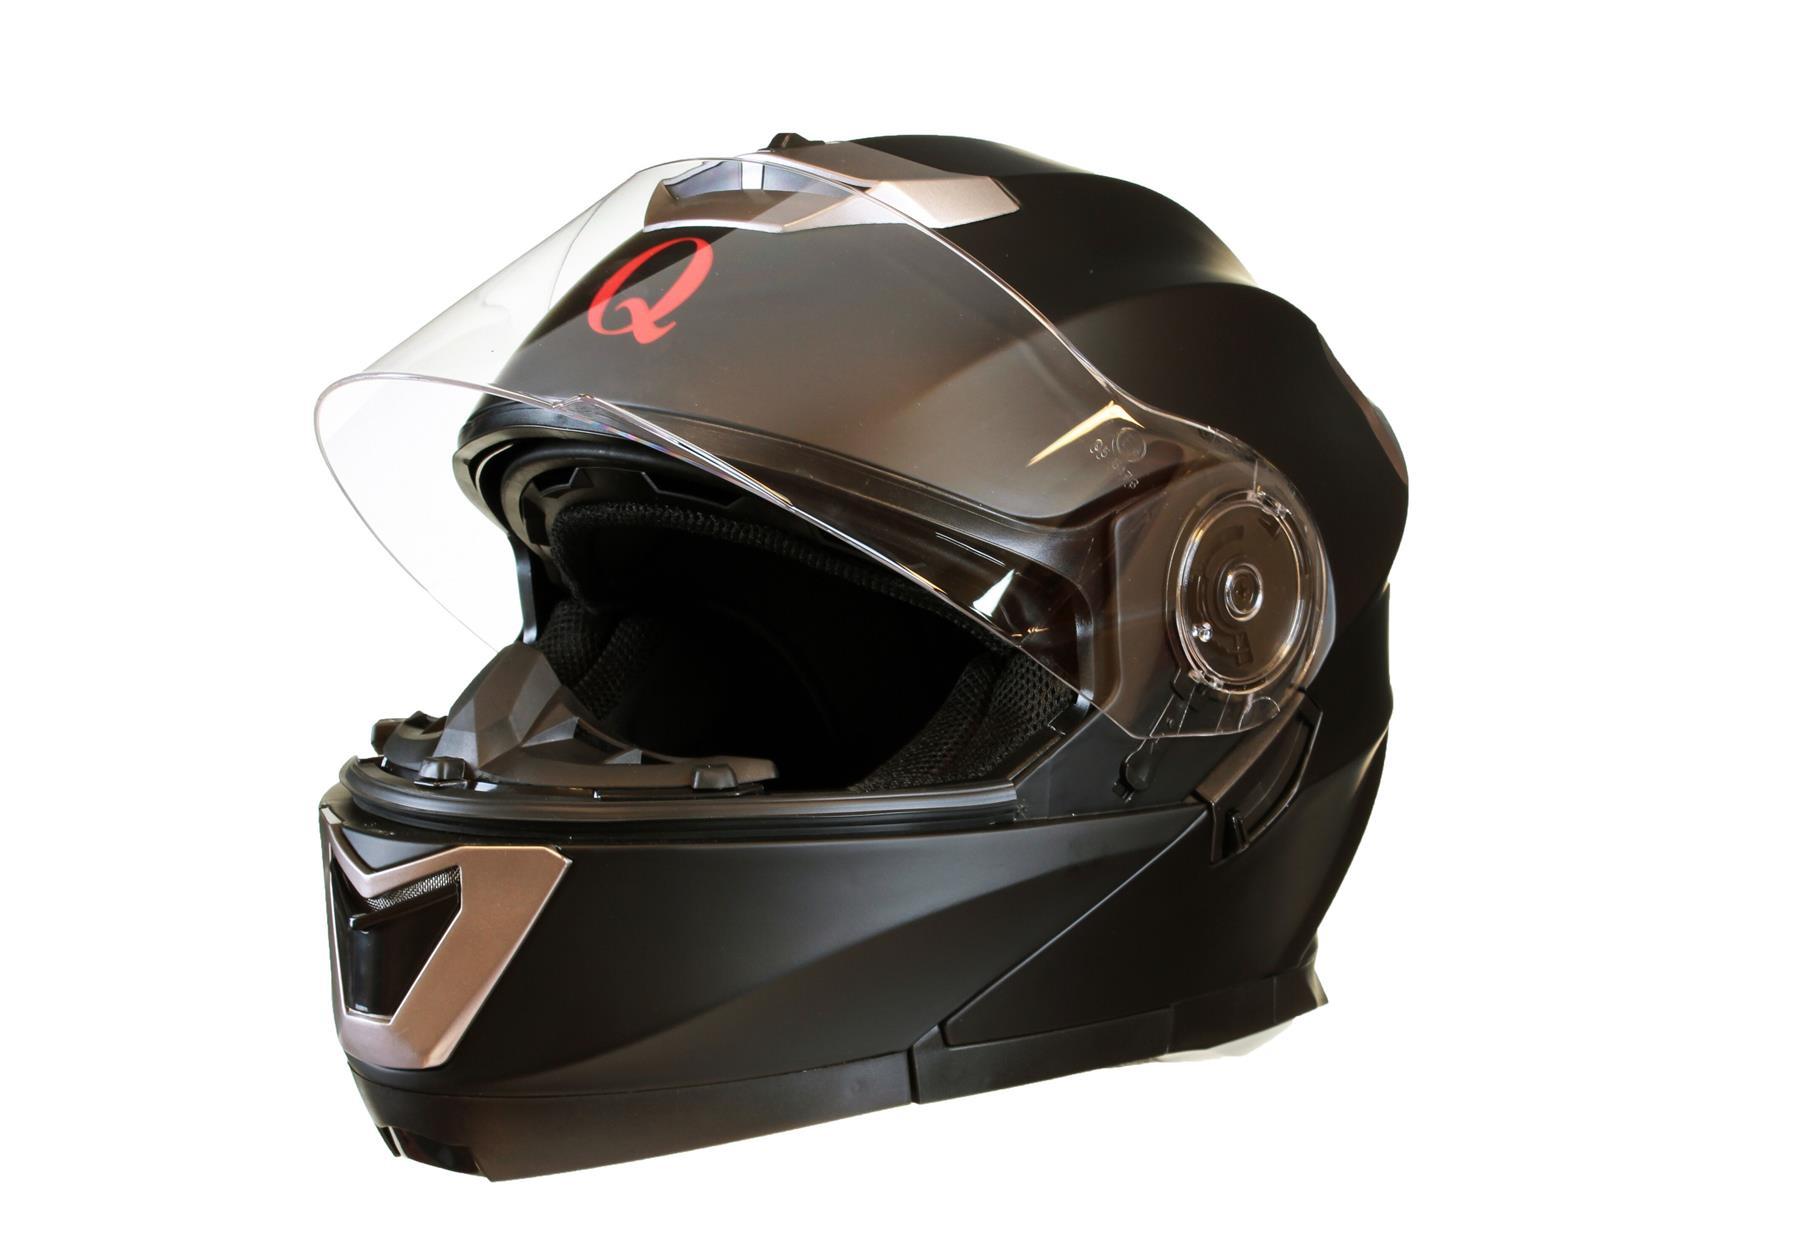 MODULAR-Flip-up-Front-Helmet-DOUBLE-Visor-MOTORCYCLE-Motorbike-Colour-CHOICE miniature 10